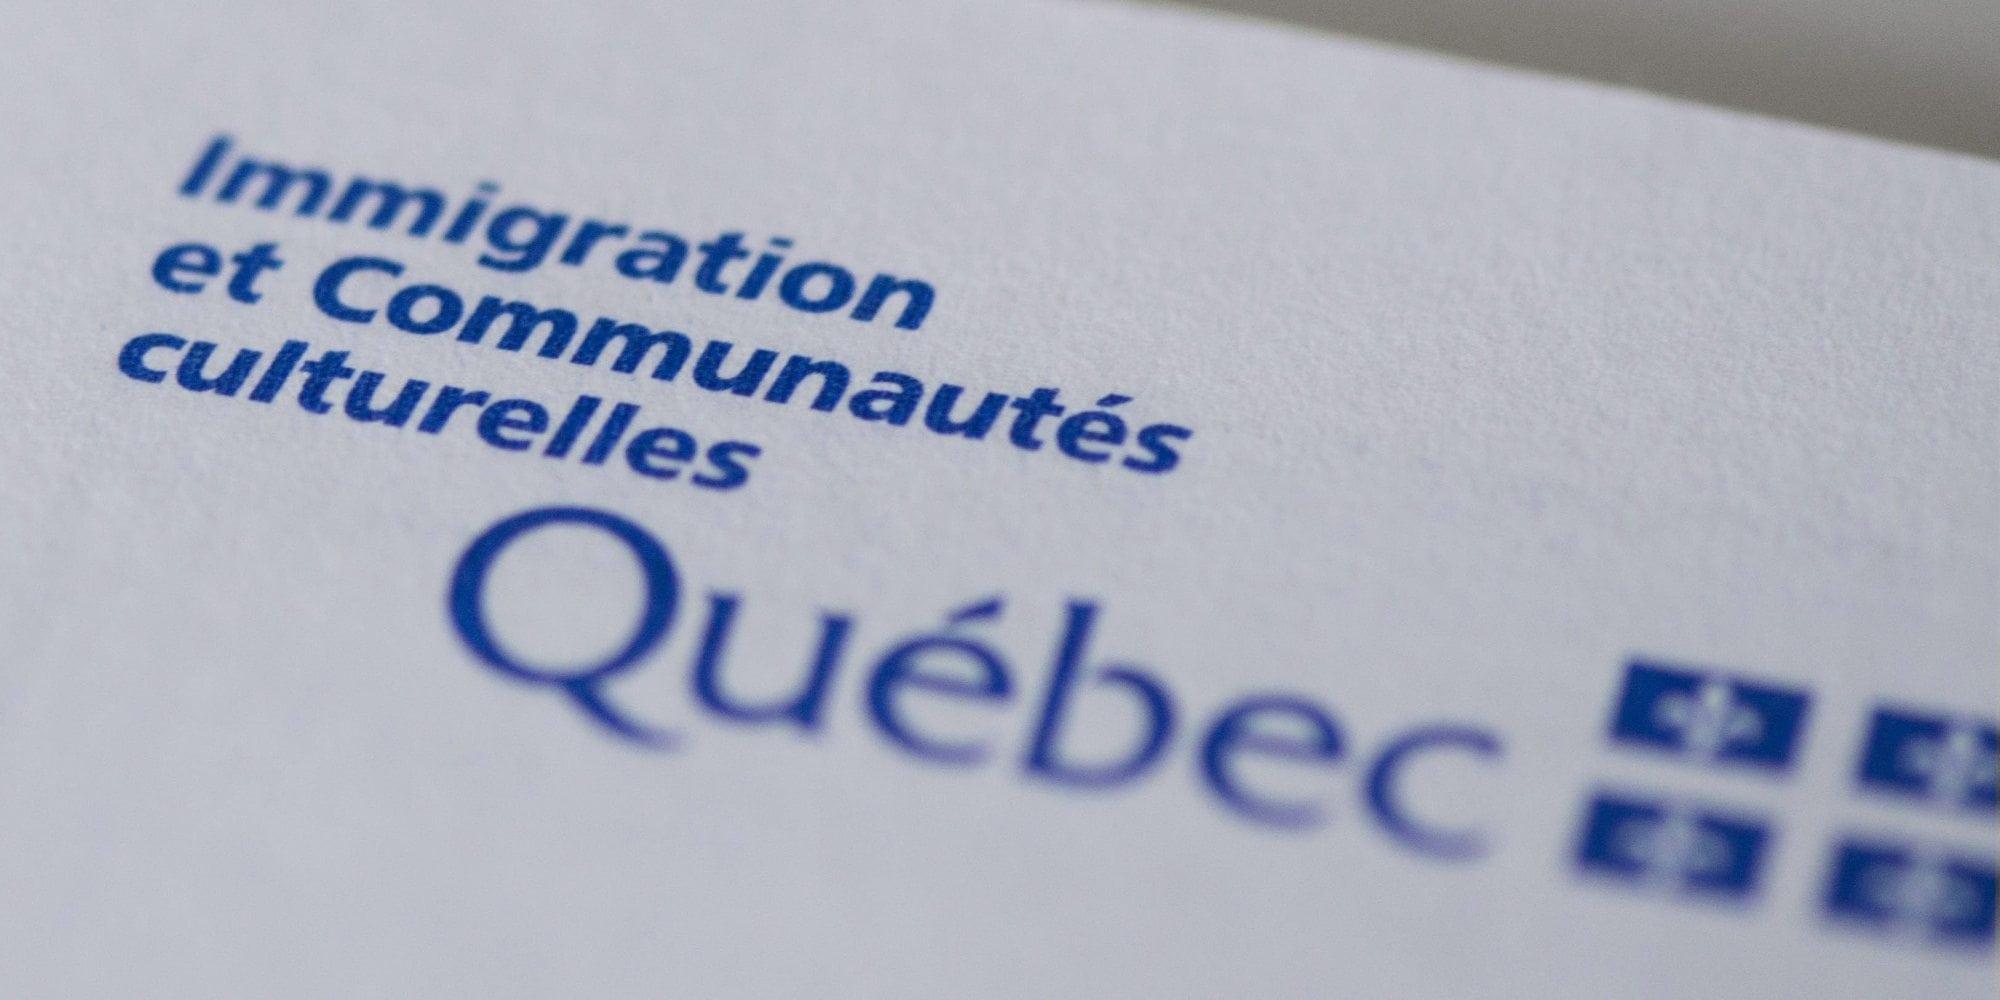 Quebec skilled worker program reopening this summer alghoul law - Bureau immigration canada ...